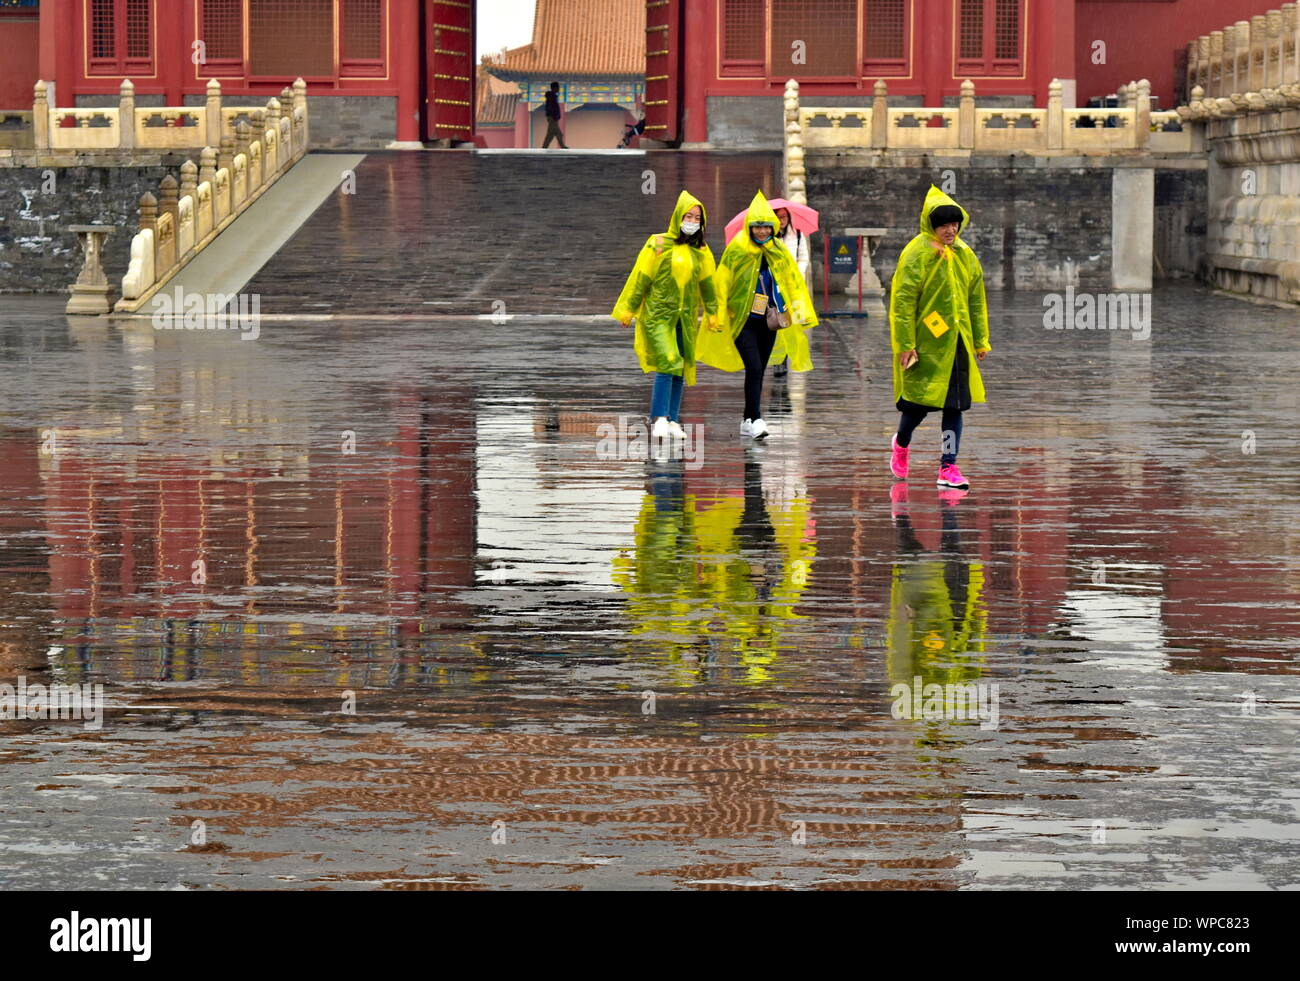 Landmark Chinese architecture of Forbidden City palace gate water reflected on rain puddles, Beijing, China Stock Photo